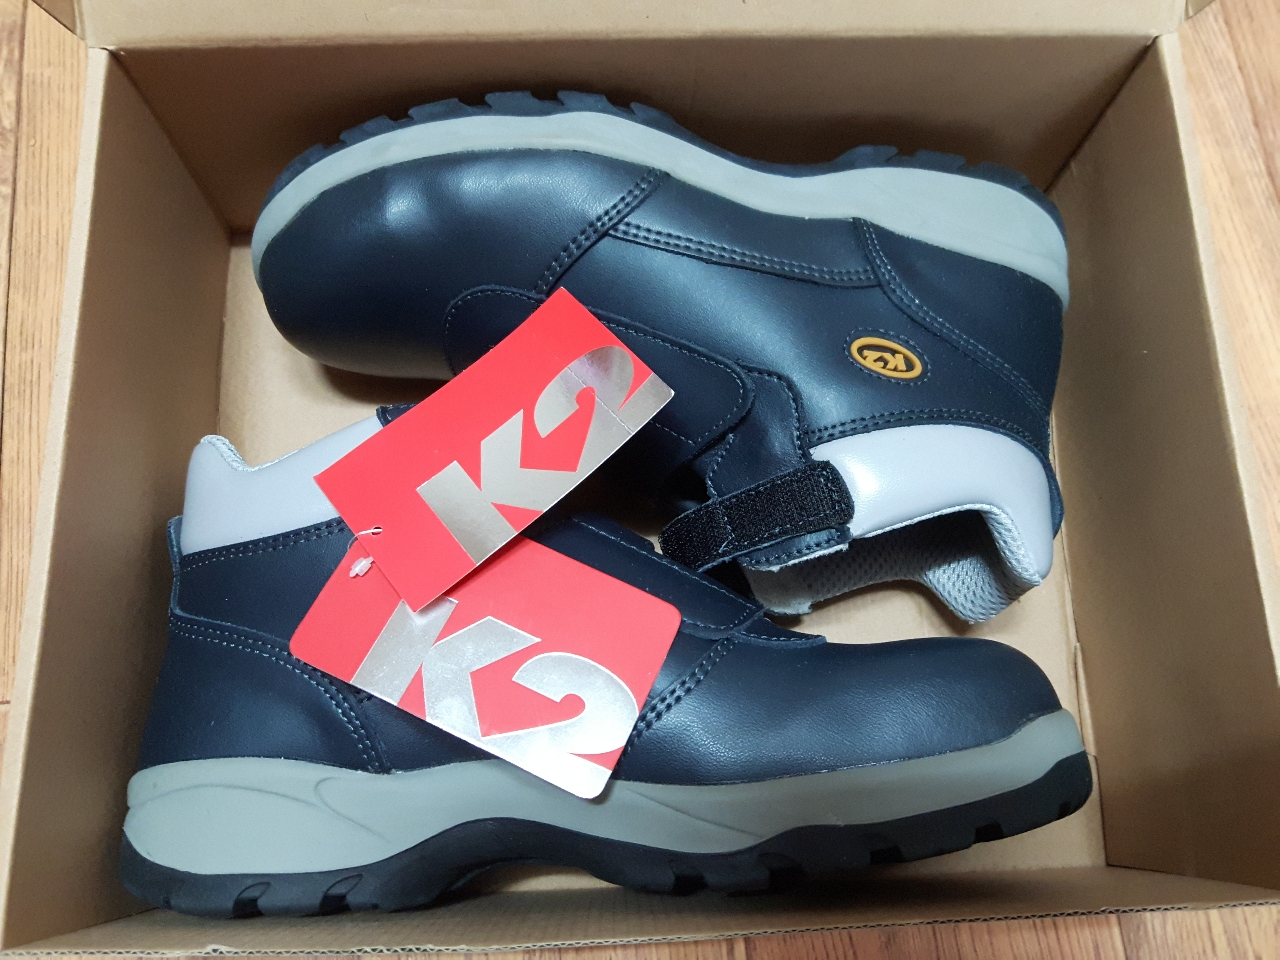 K2 찍찍이형 안전화~^^